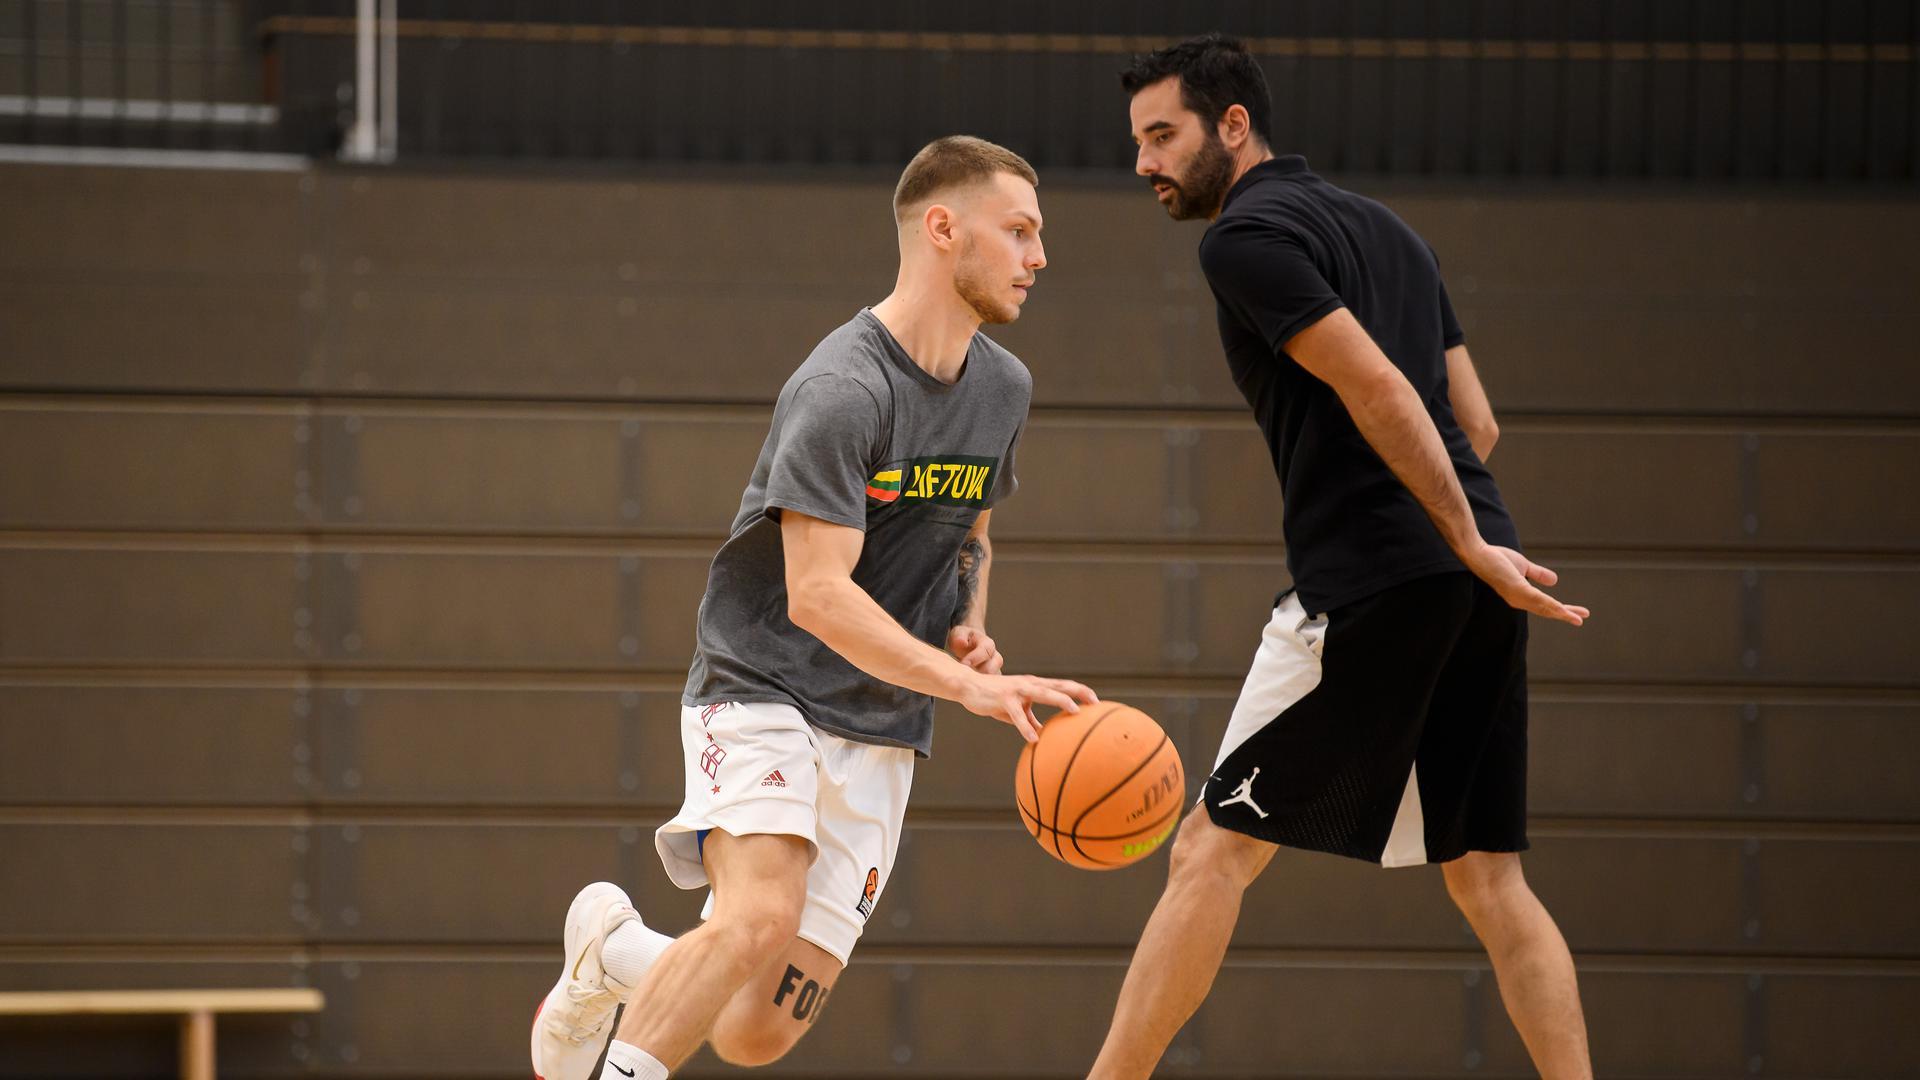 Ferdinand Zylka (Lions) mit Trainer Aleksandar Scepanovic (Lions).  GES/ Basketball/ ProA: PSK Lions - Training, 12.08.2021 --